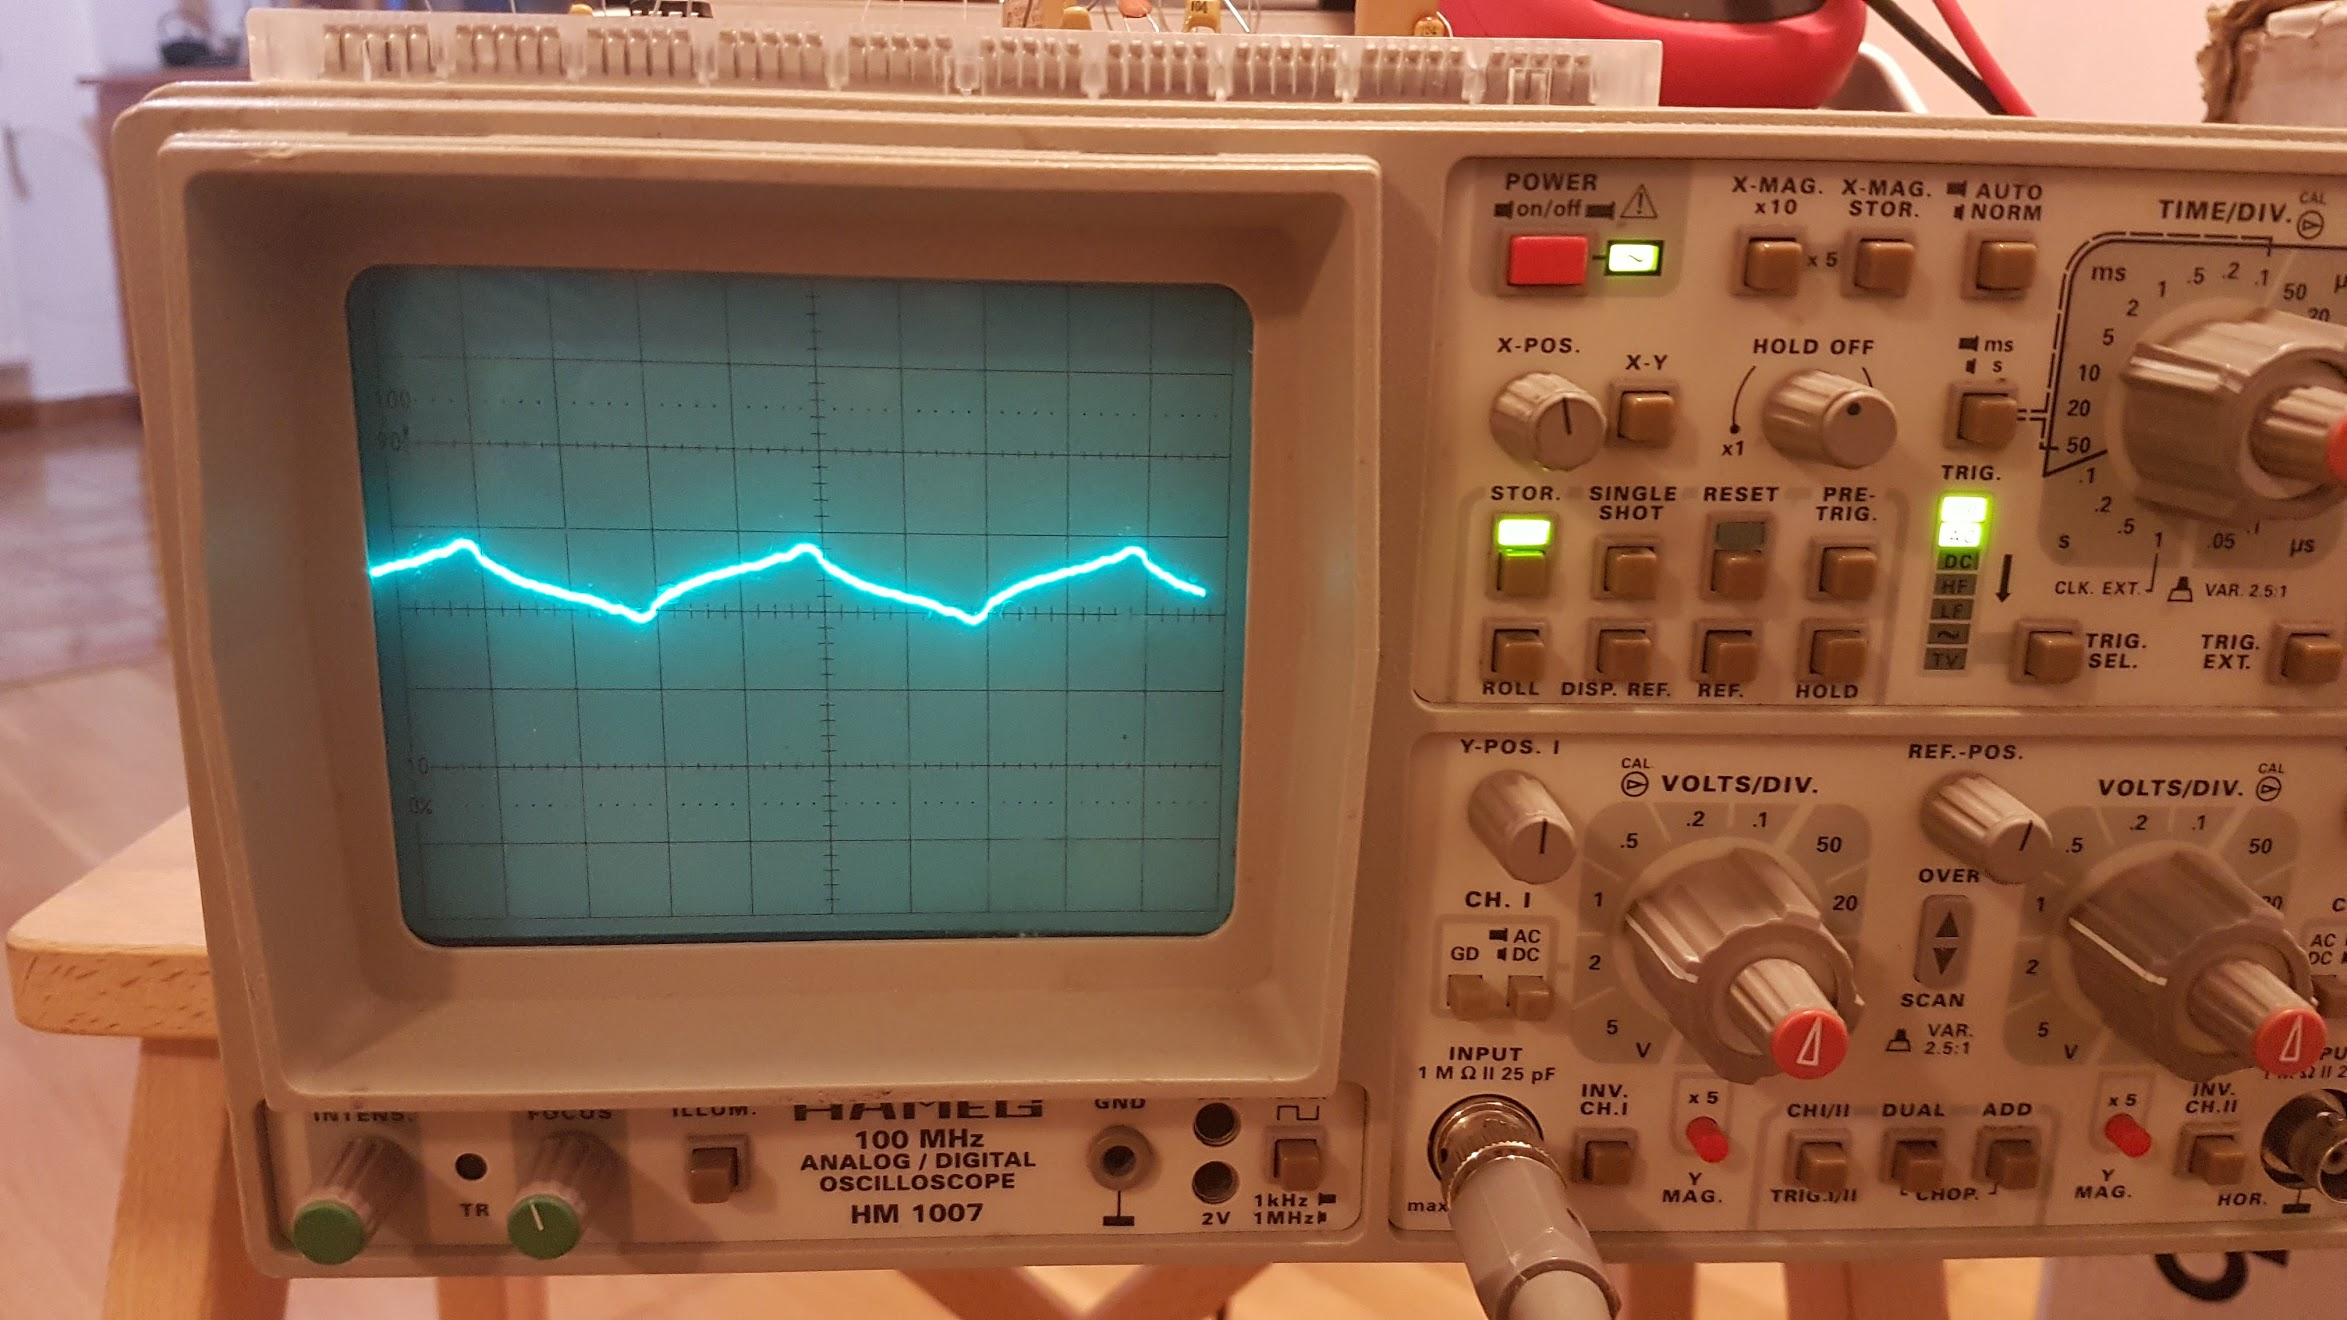 Energy monitor oscilloscope